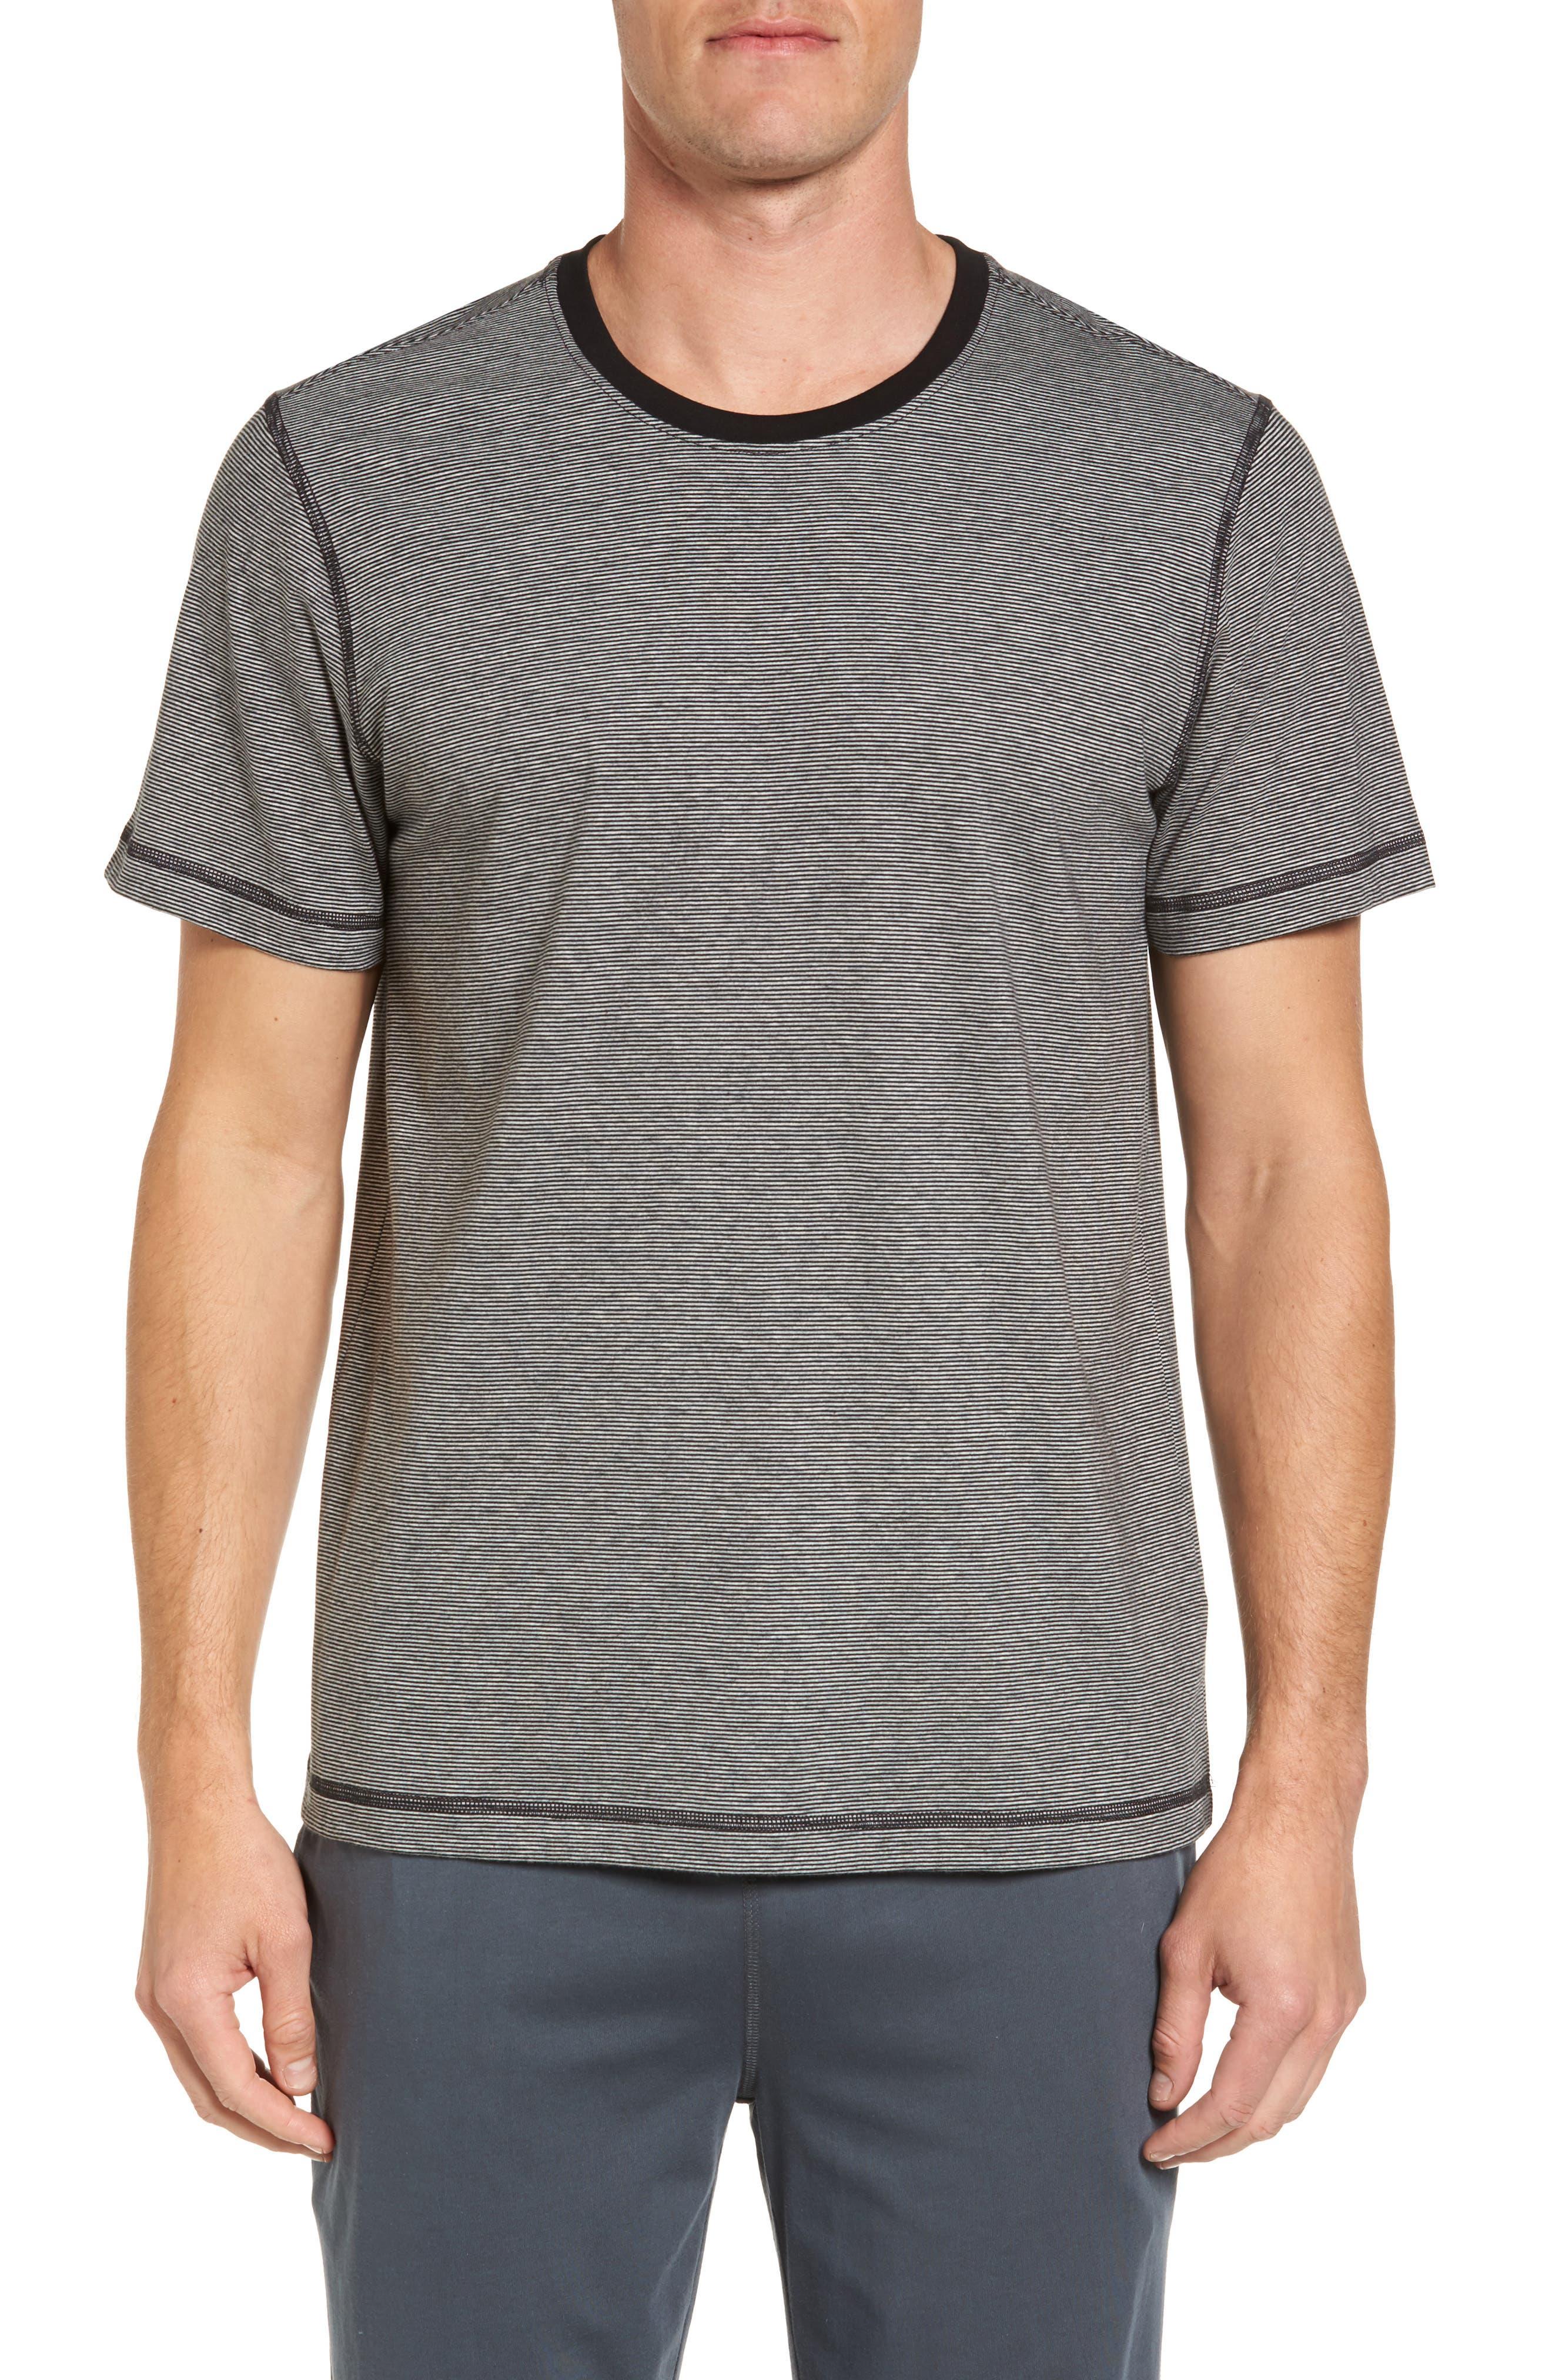 Main Image - Daniel Buchler Peruvian Pima Cotton T-Shirt